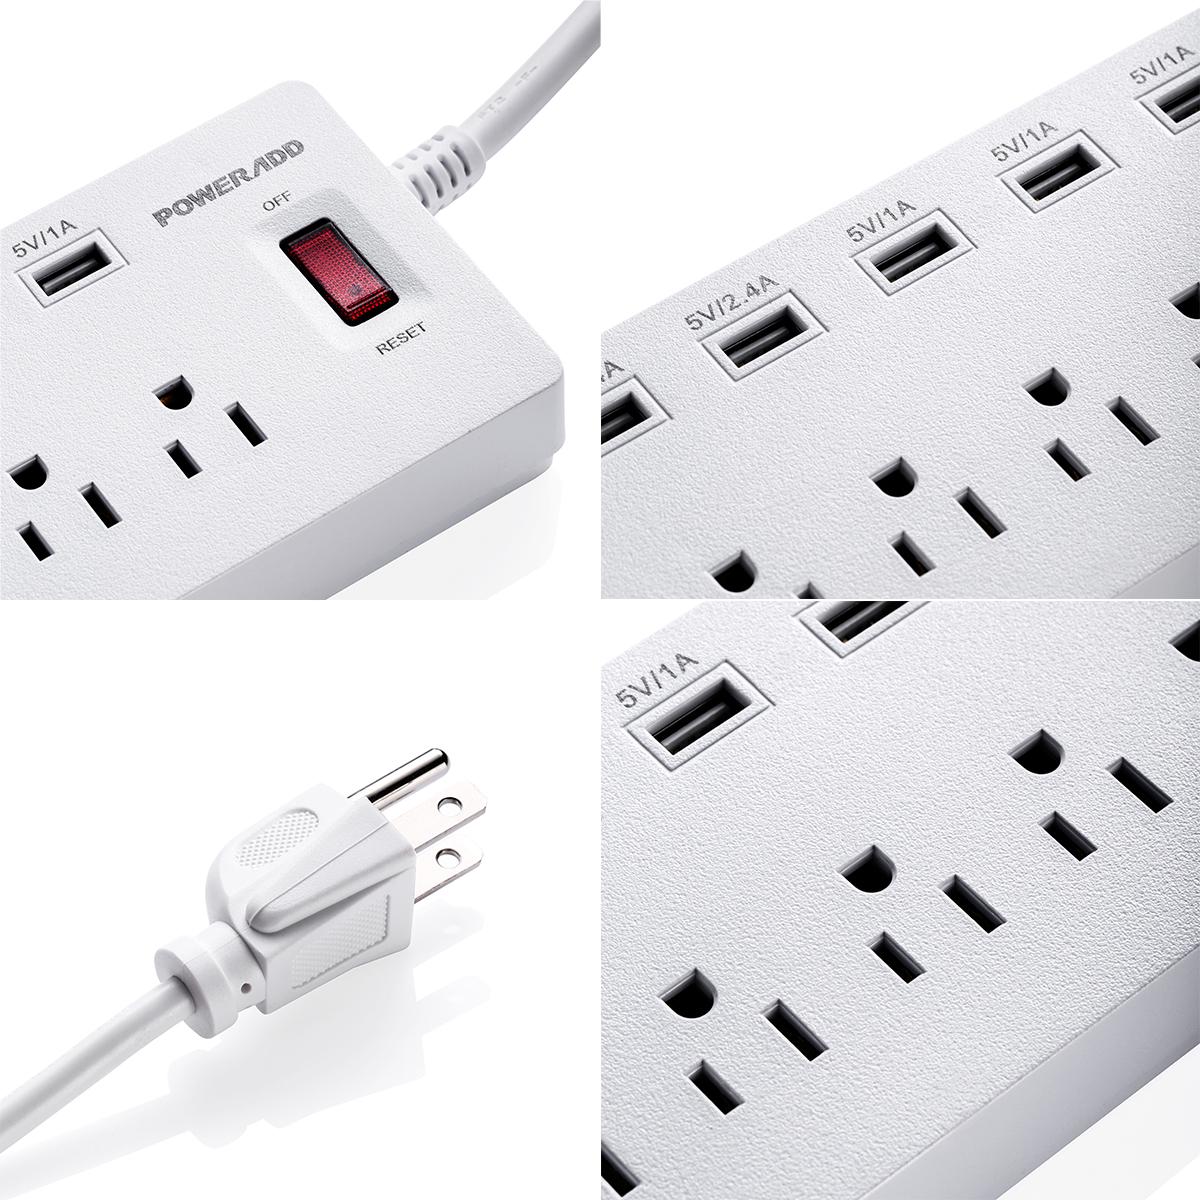 6ft 6 outlet 6 usb charging port power strip with surge protector lightningproof ebay. Black Bedroom Furniture Sets. Home Design Ideas